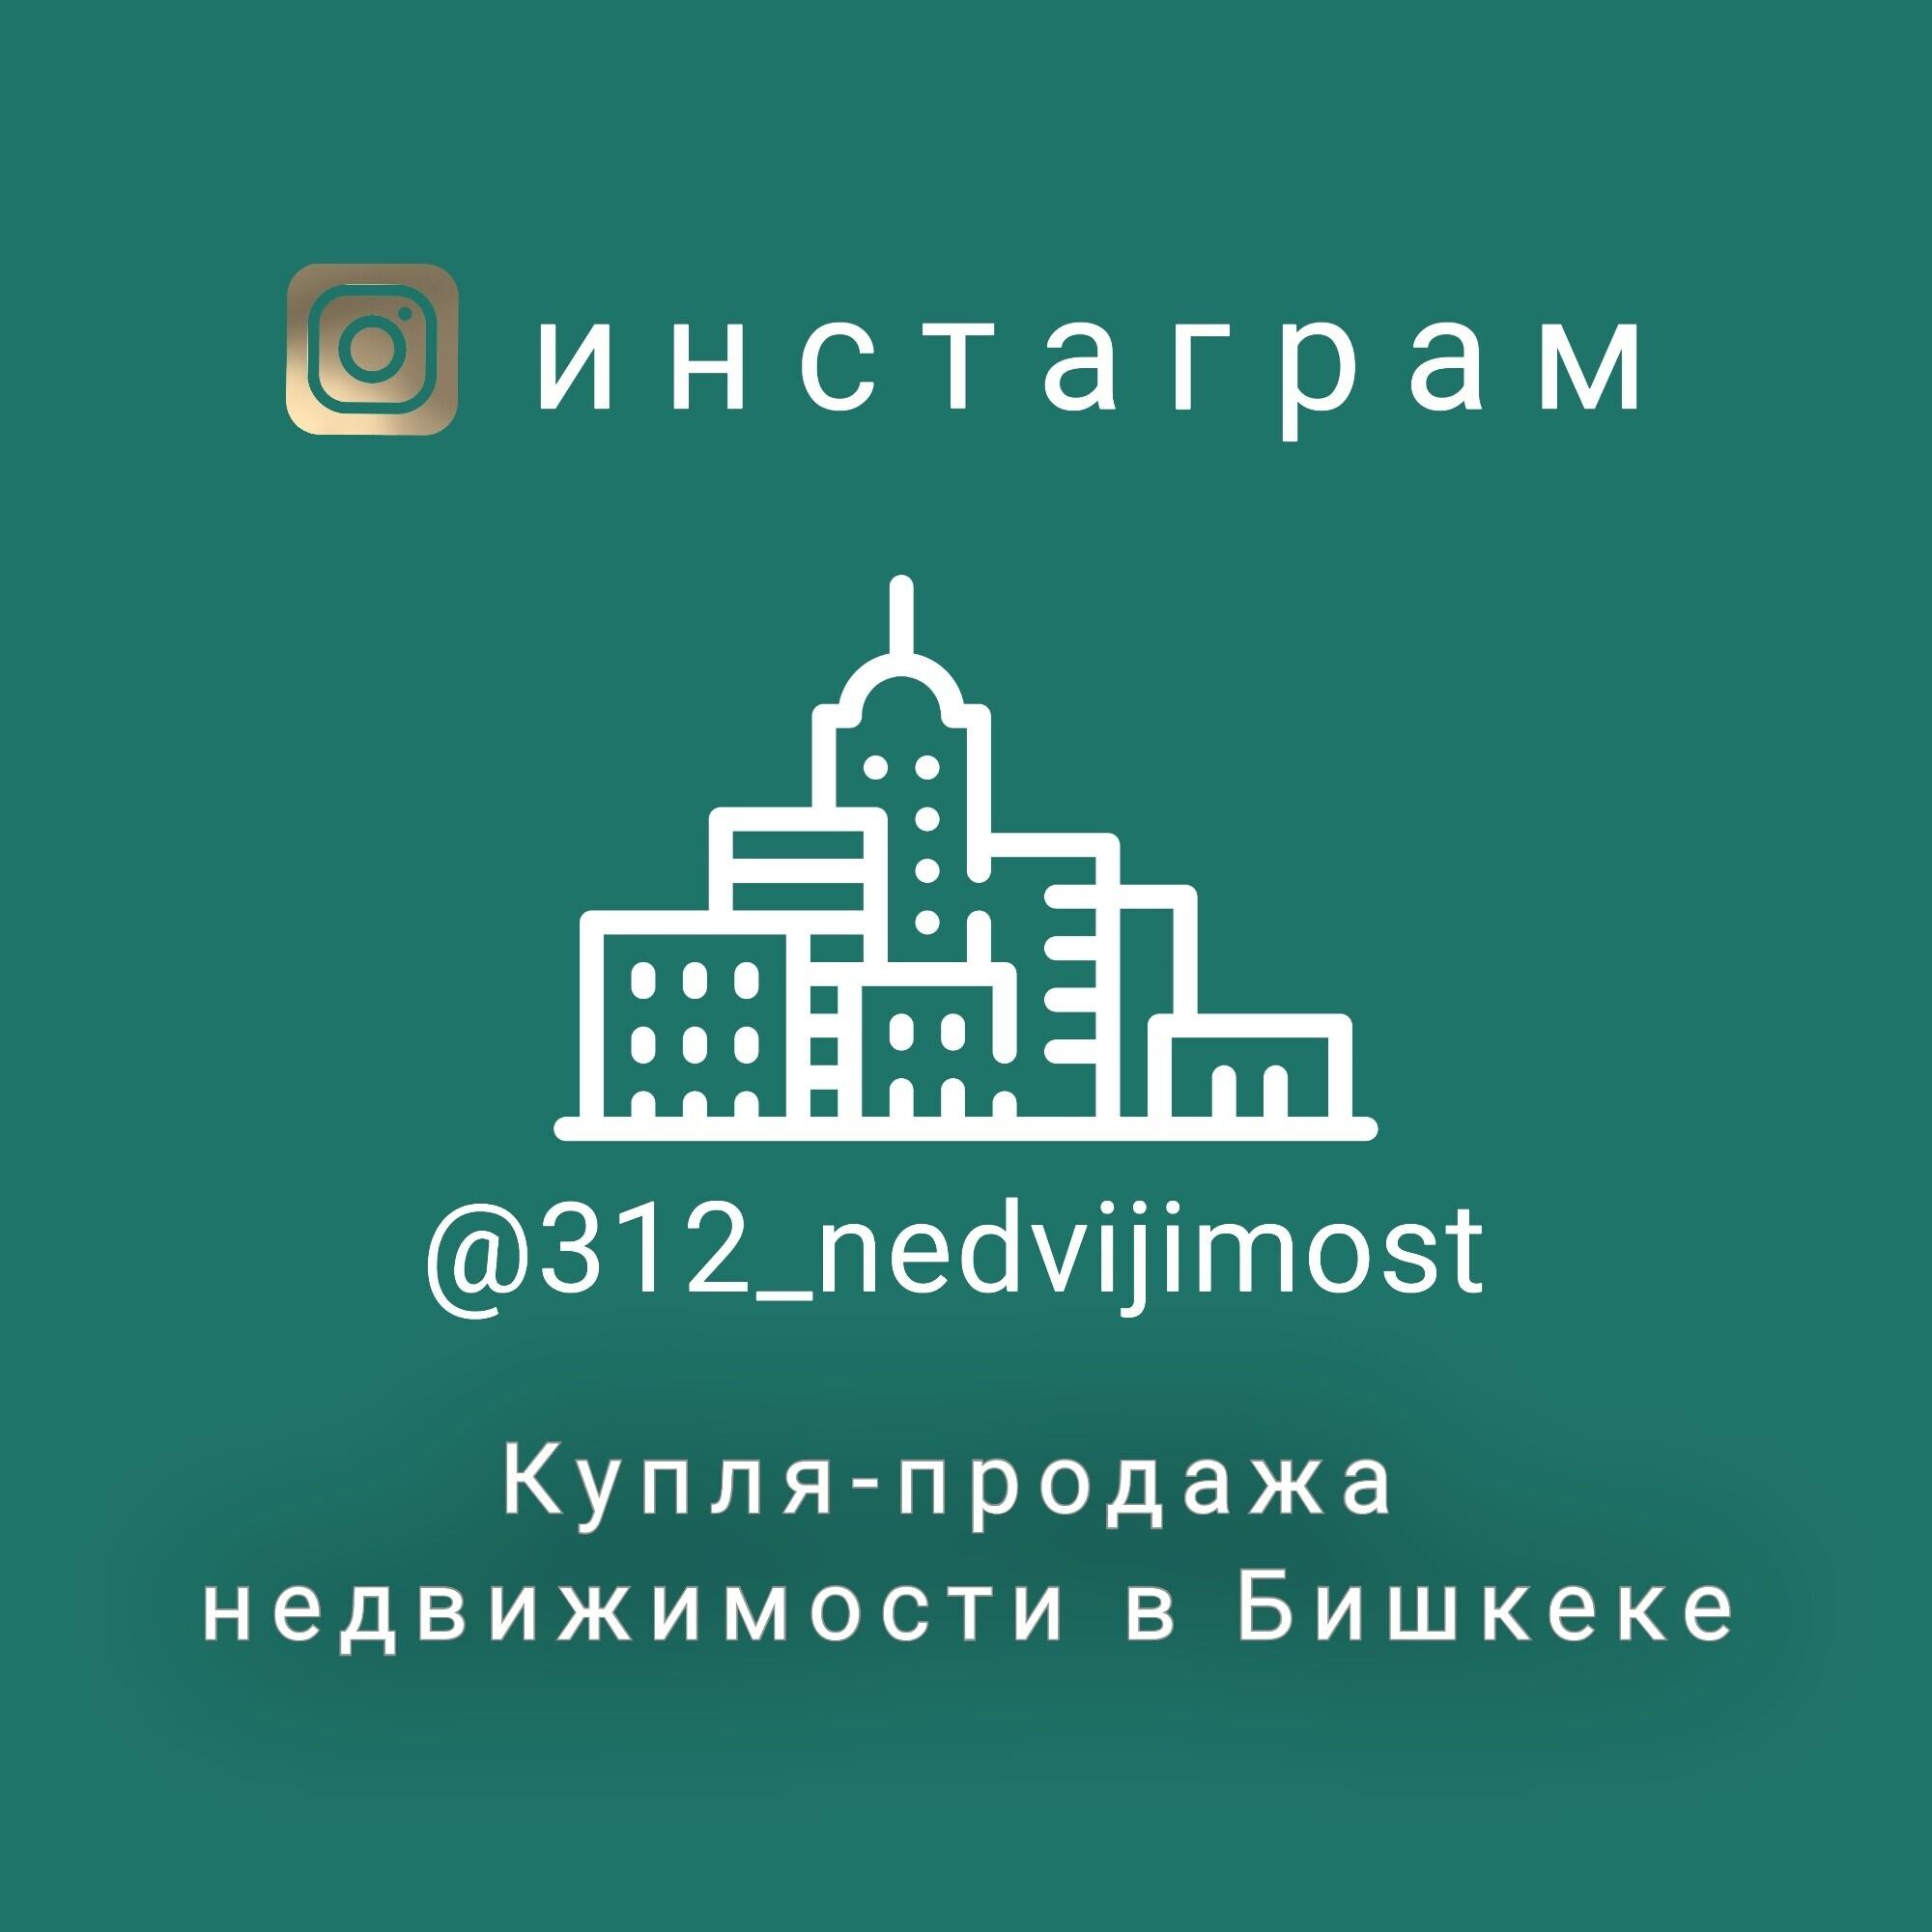 312_nedvijimost(инстаграм) - Бизнес-профиль компании на lalafo.kg | Кыргызстан